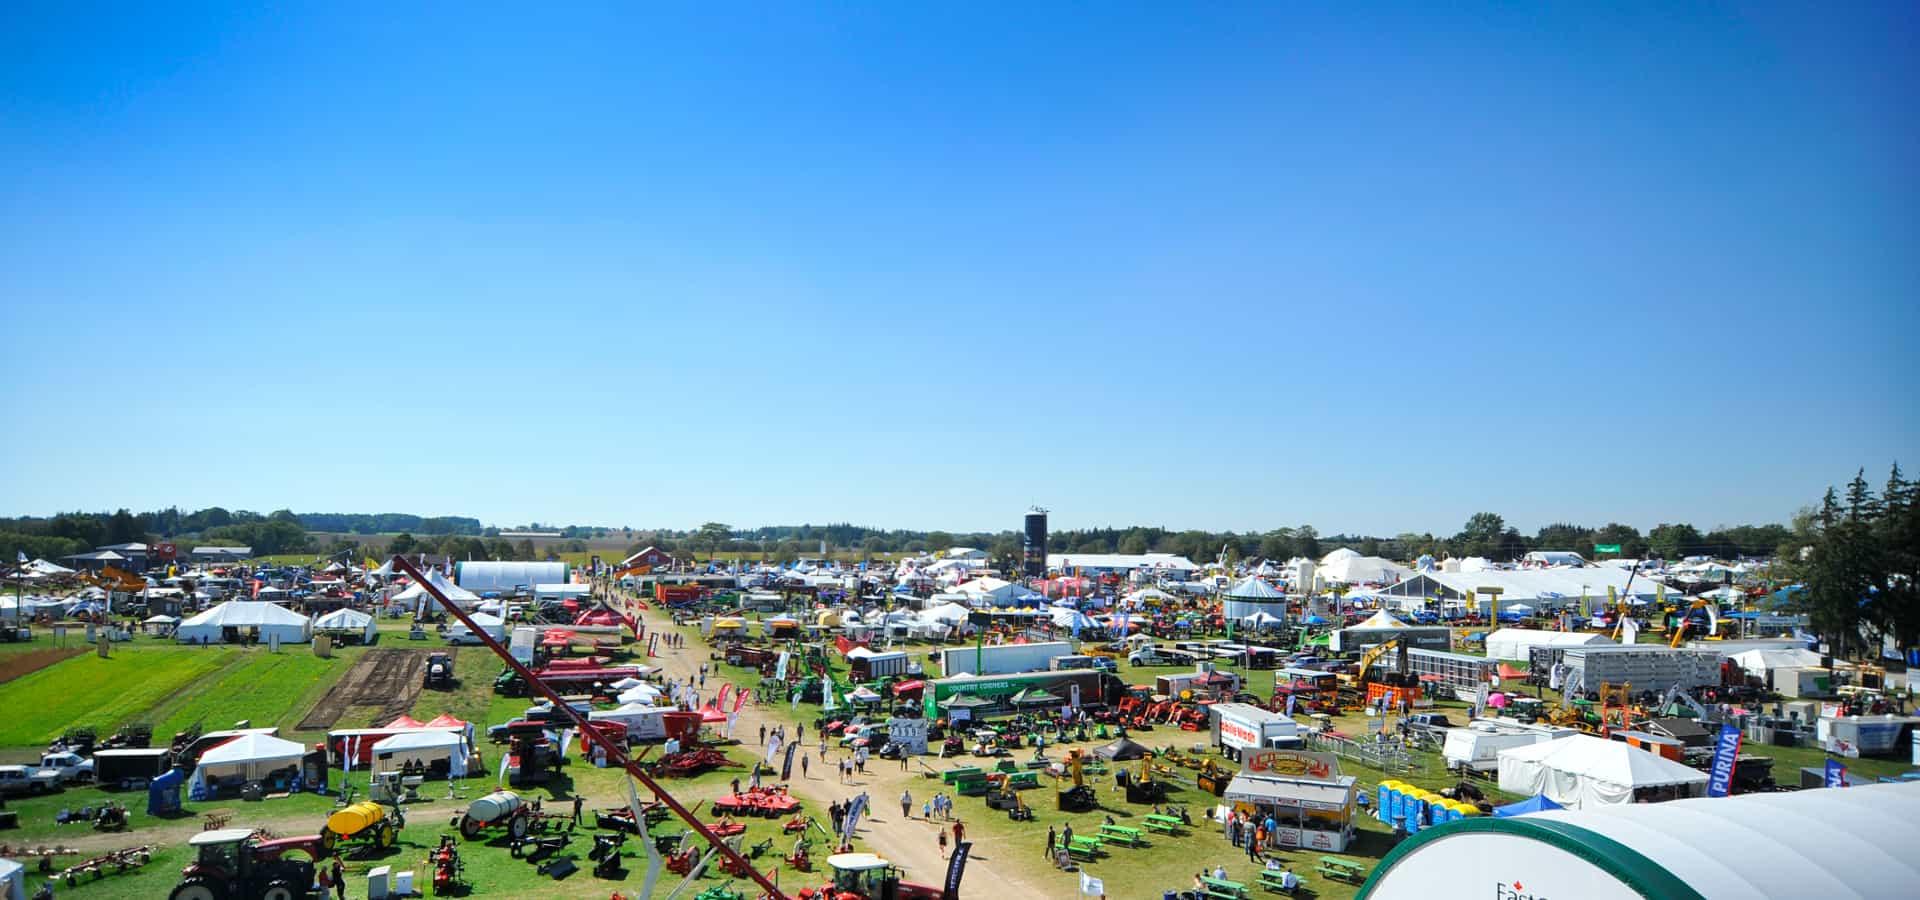 Canada's Outdoor Farm Show aerial photo